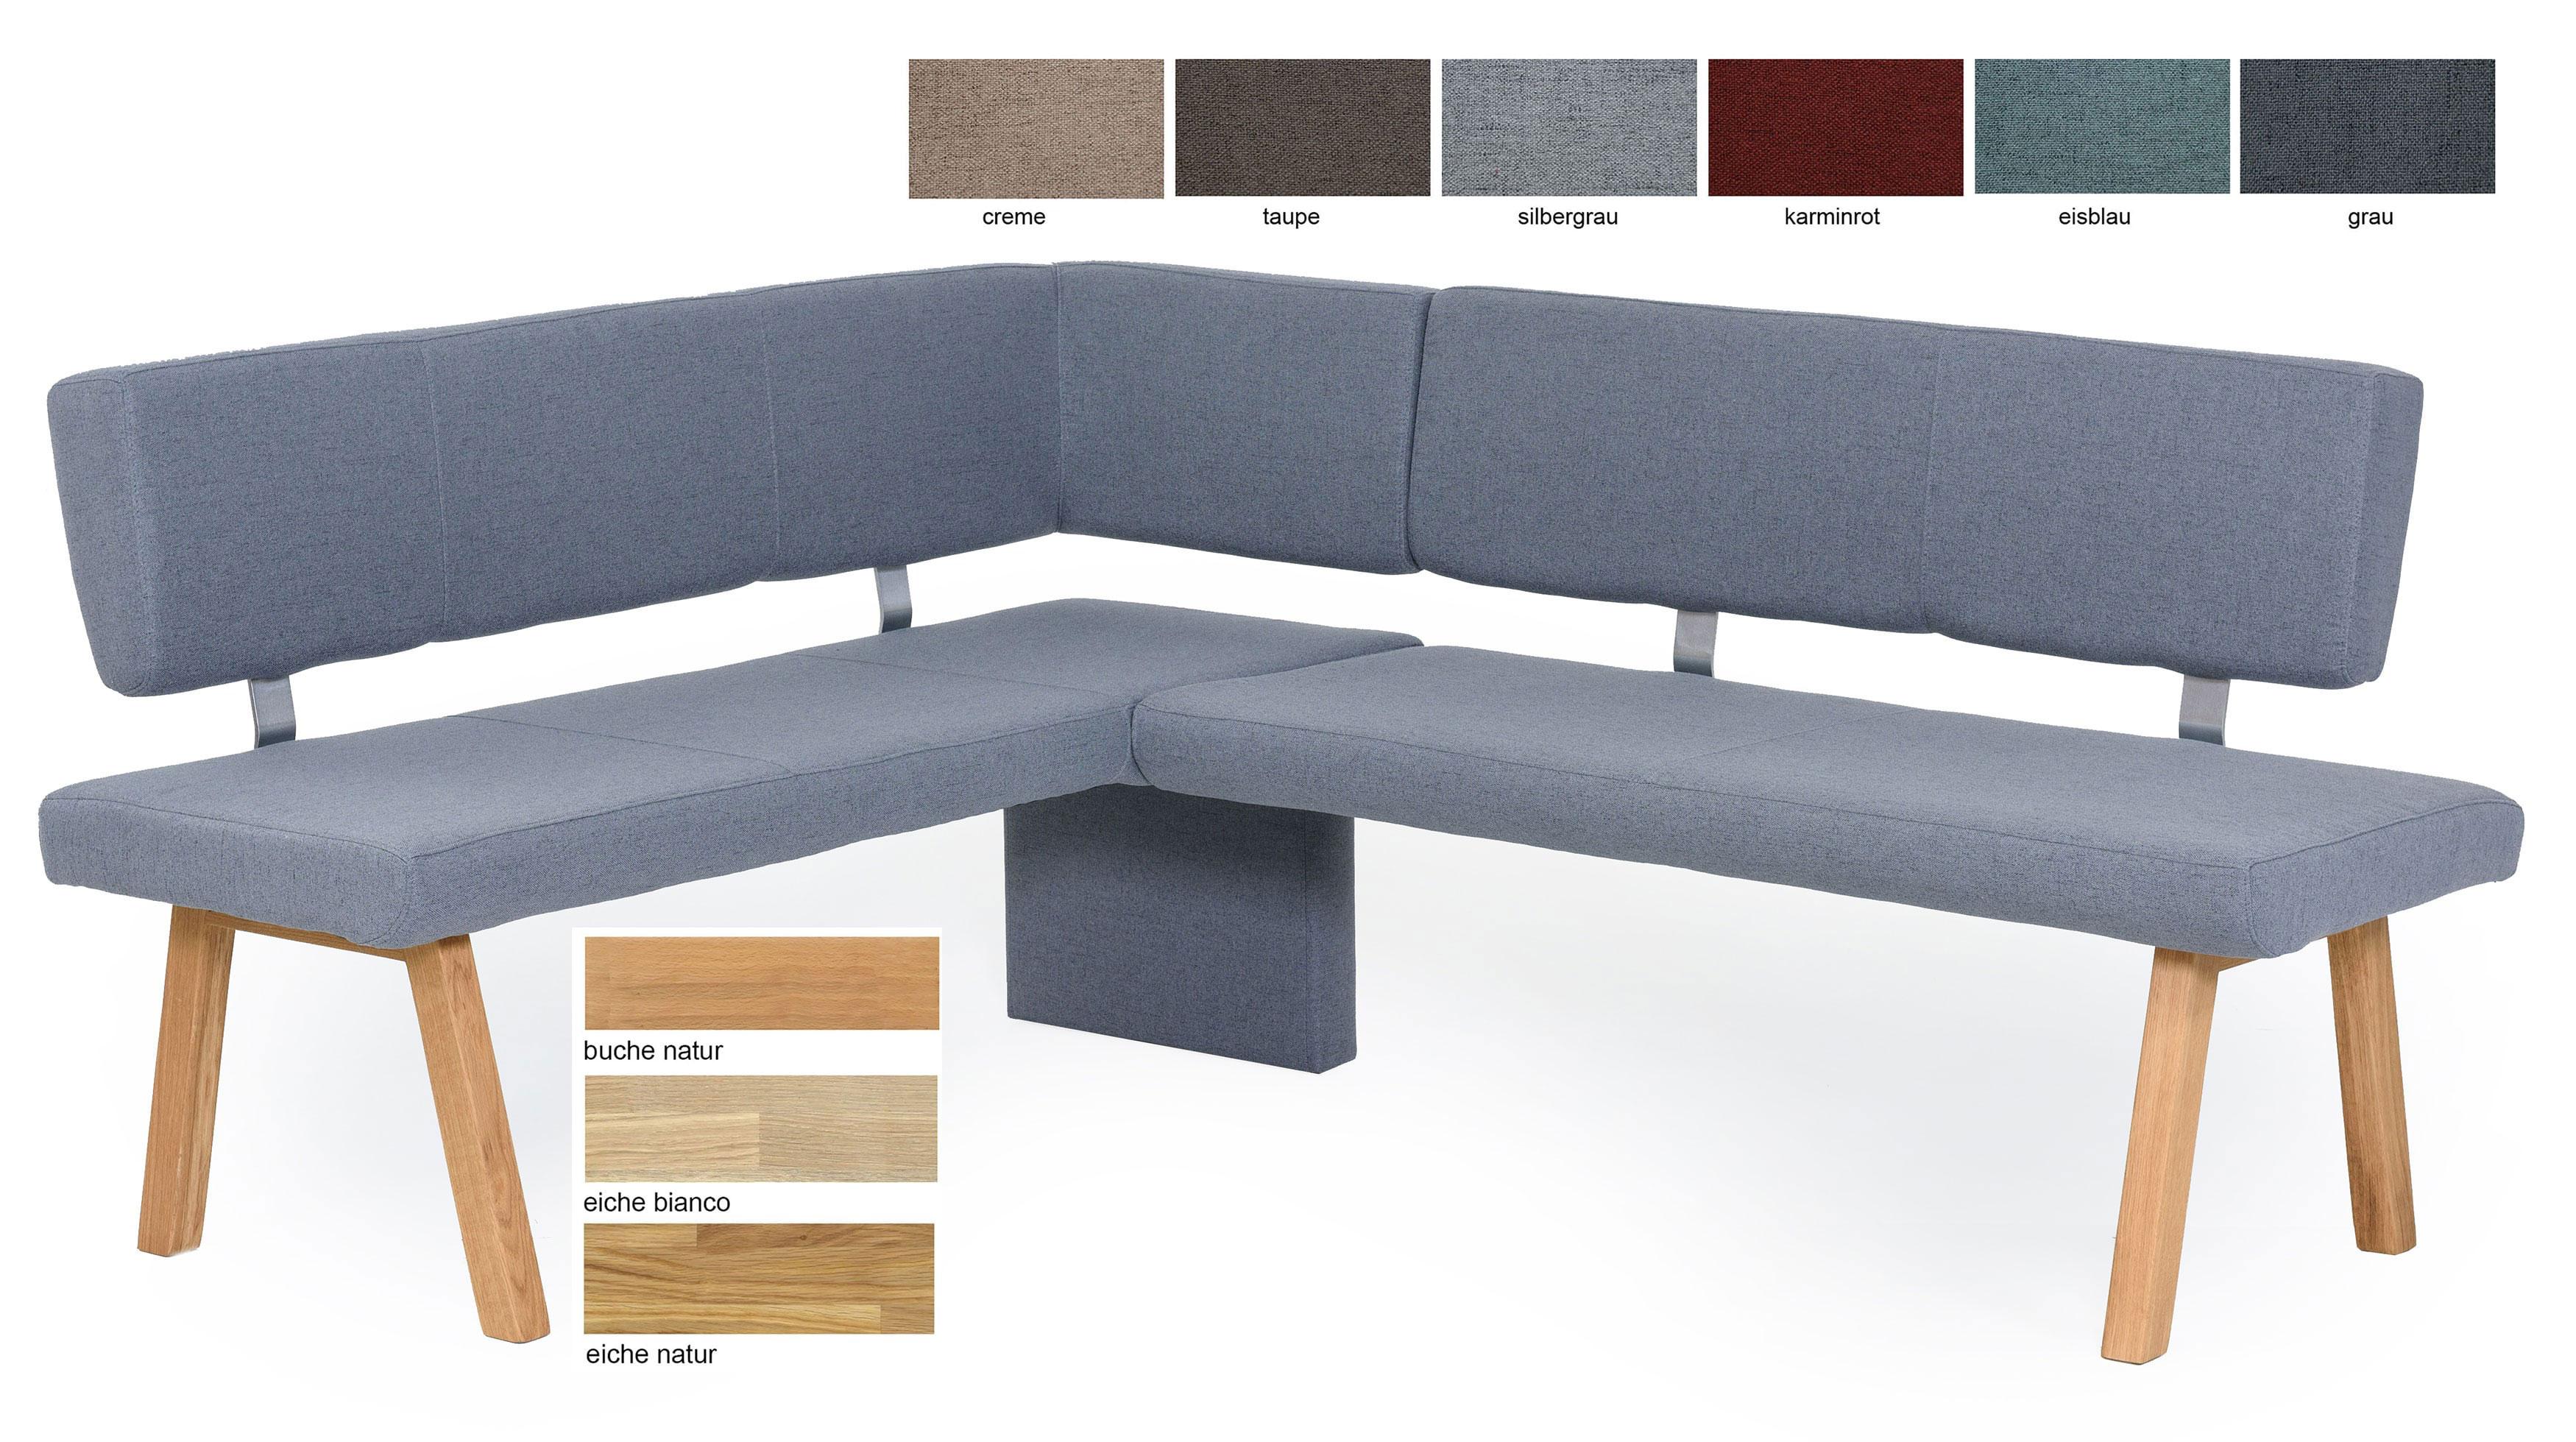 Standard Furniture Konstanz Eckbank